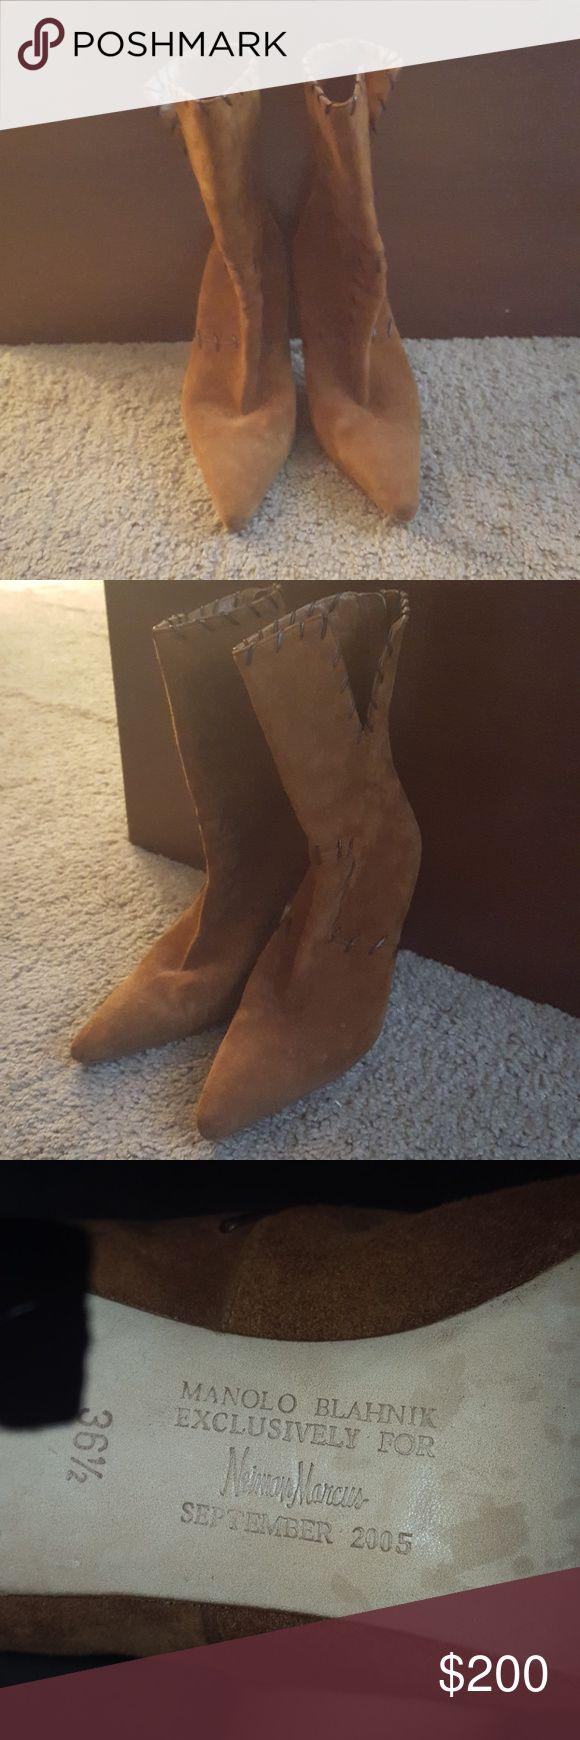 Monolo Blahnik Exclusively for Neiman Marcus Monolo Blahnik boots European size 36 1/2. Neiman Marcus Shoes Heeled Boots